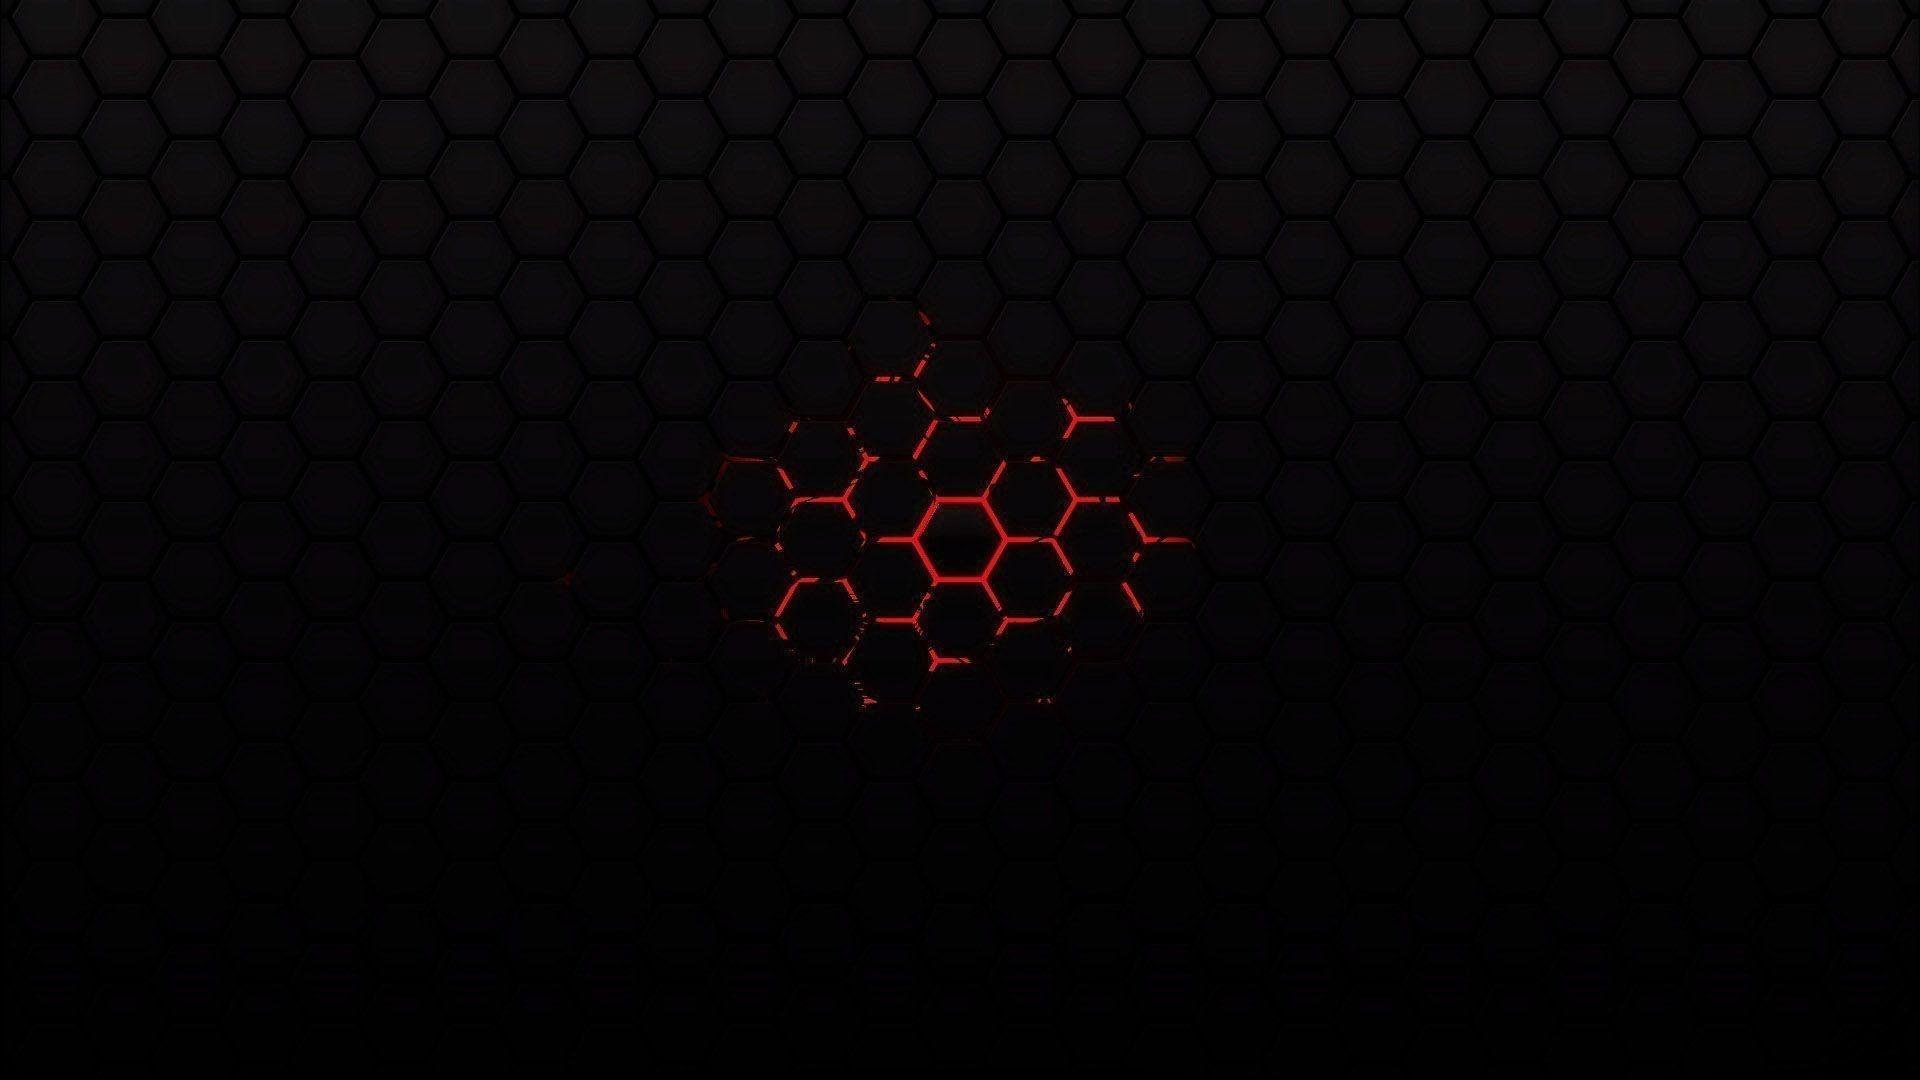 10 Best Red Black Wallpaper 1920X1080 FULL HD 1080p For PC ...